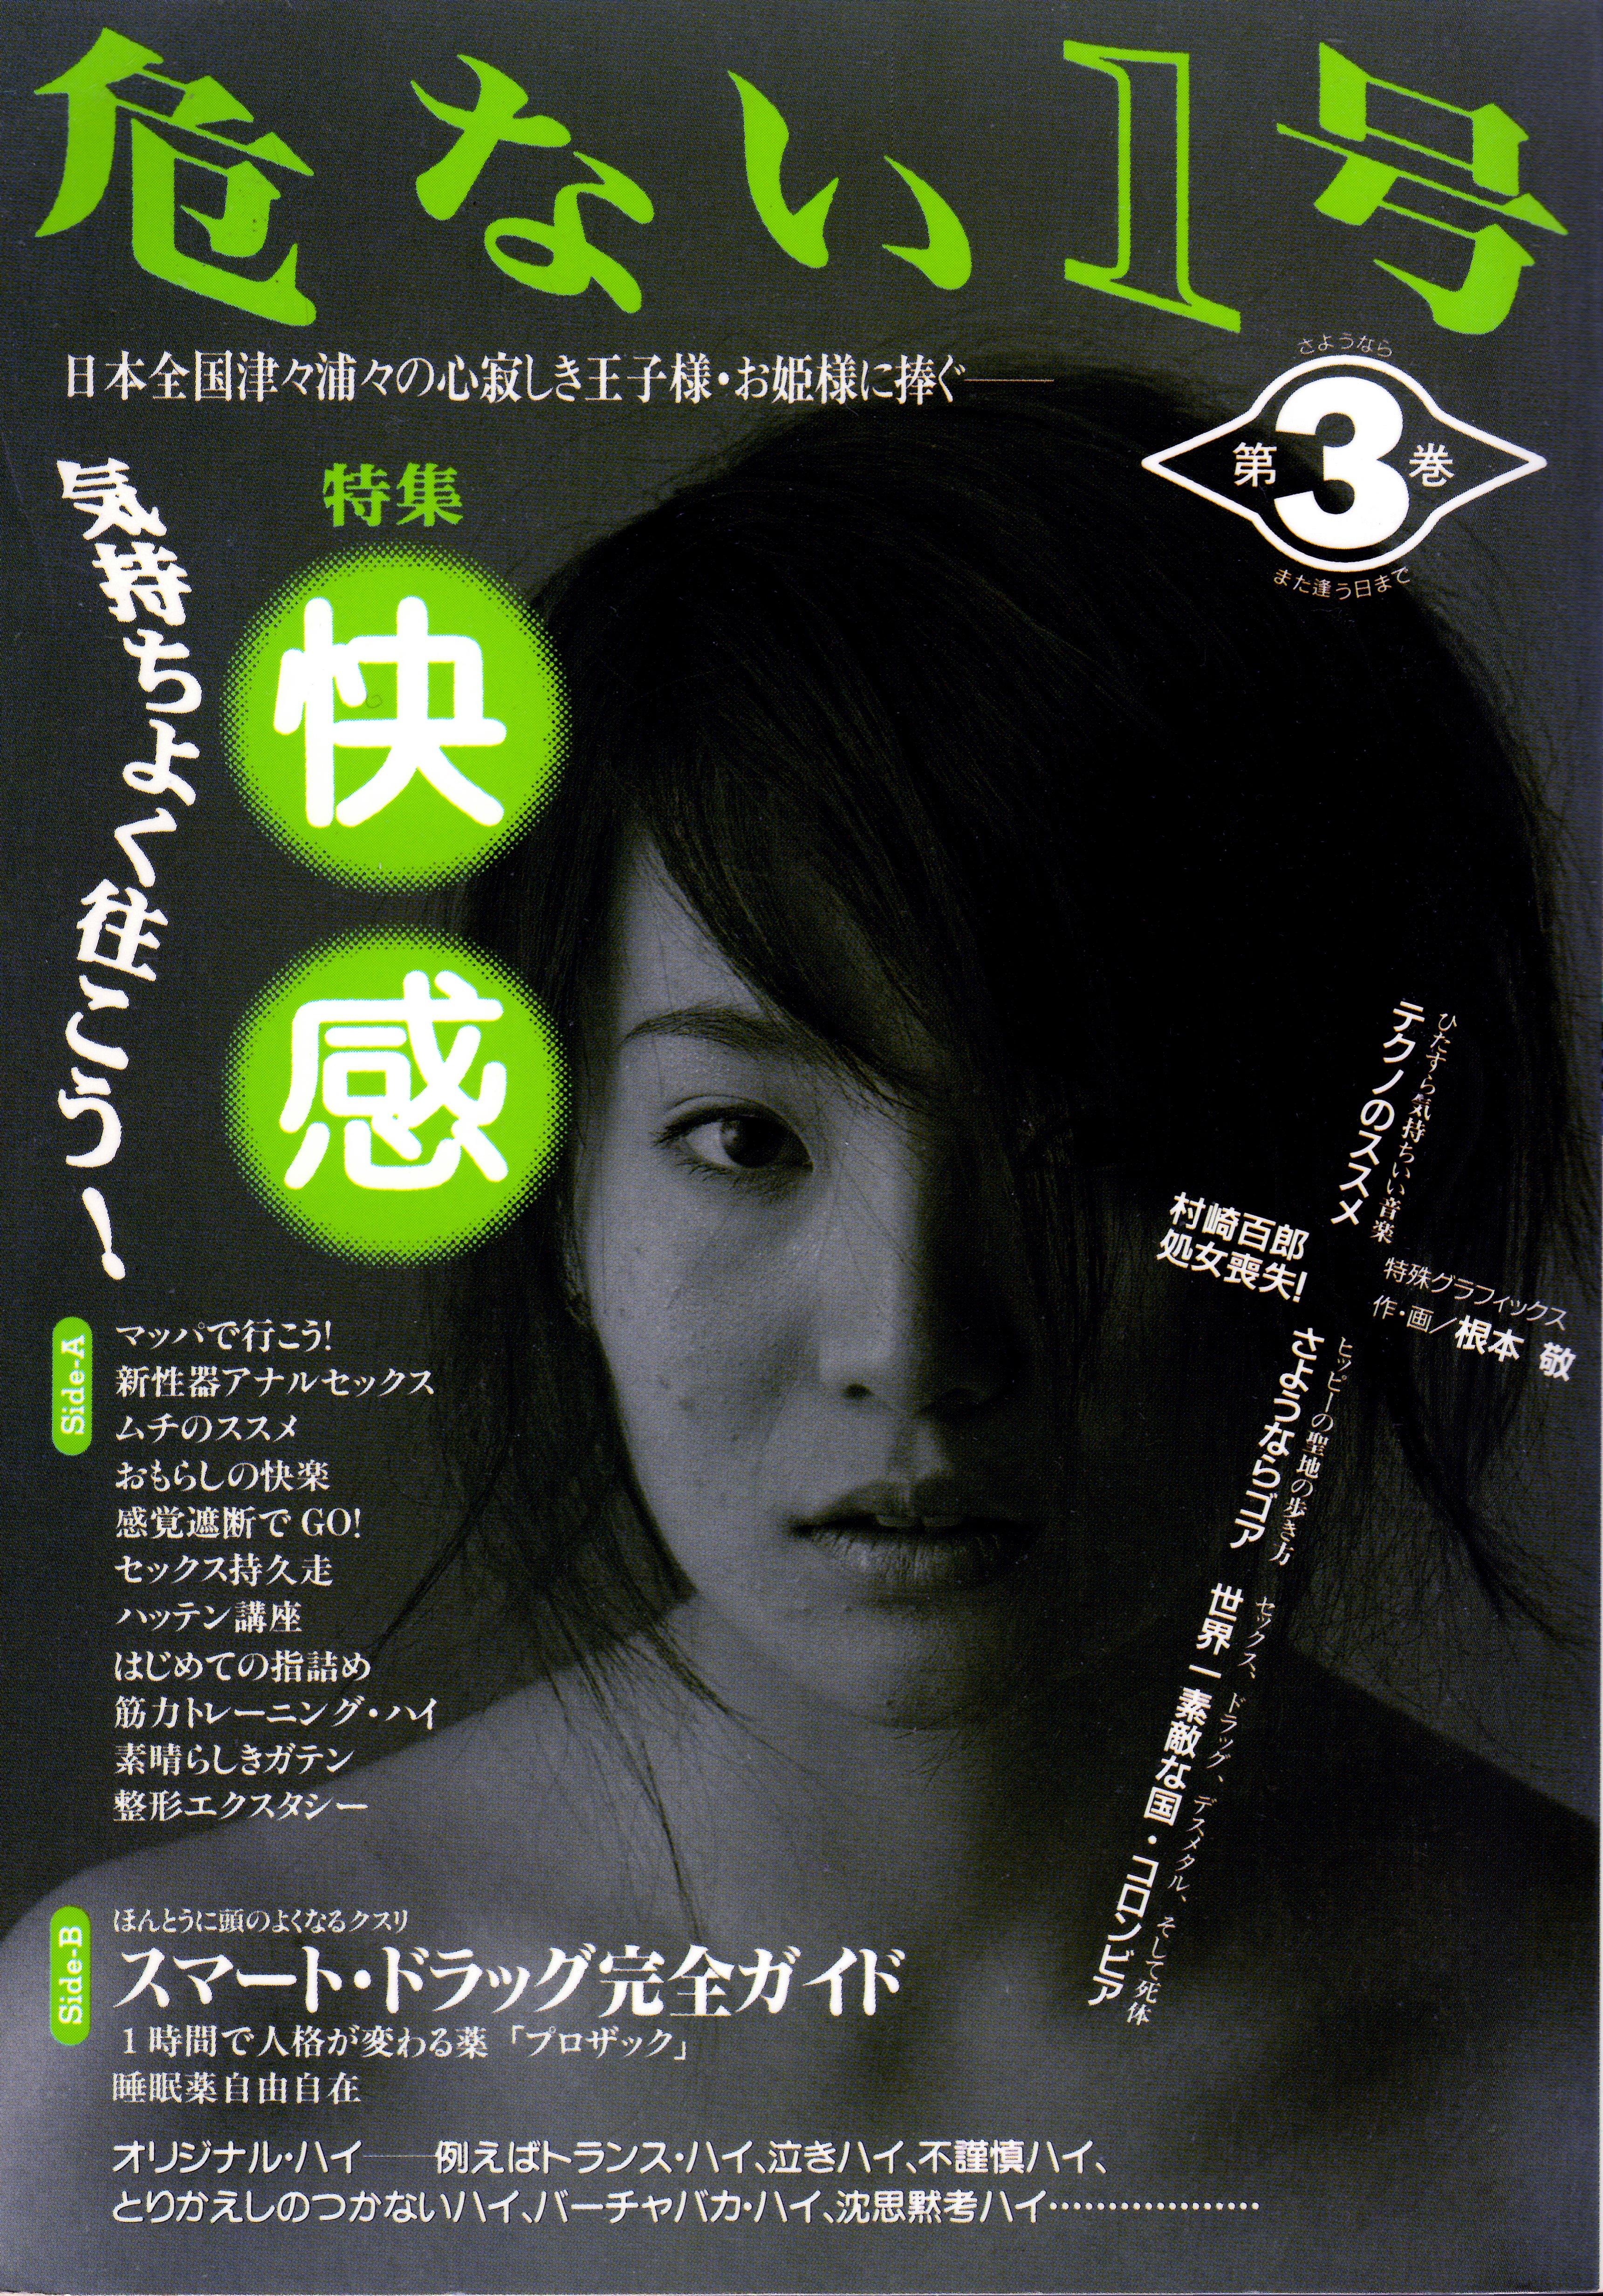 f:id:kougasetumei:20191221234822j:image:w400